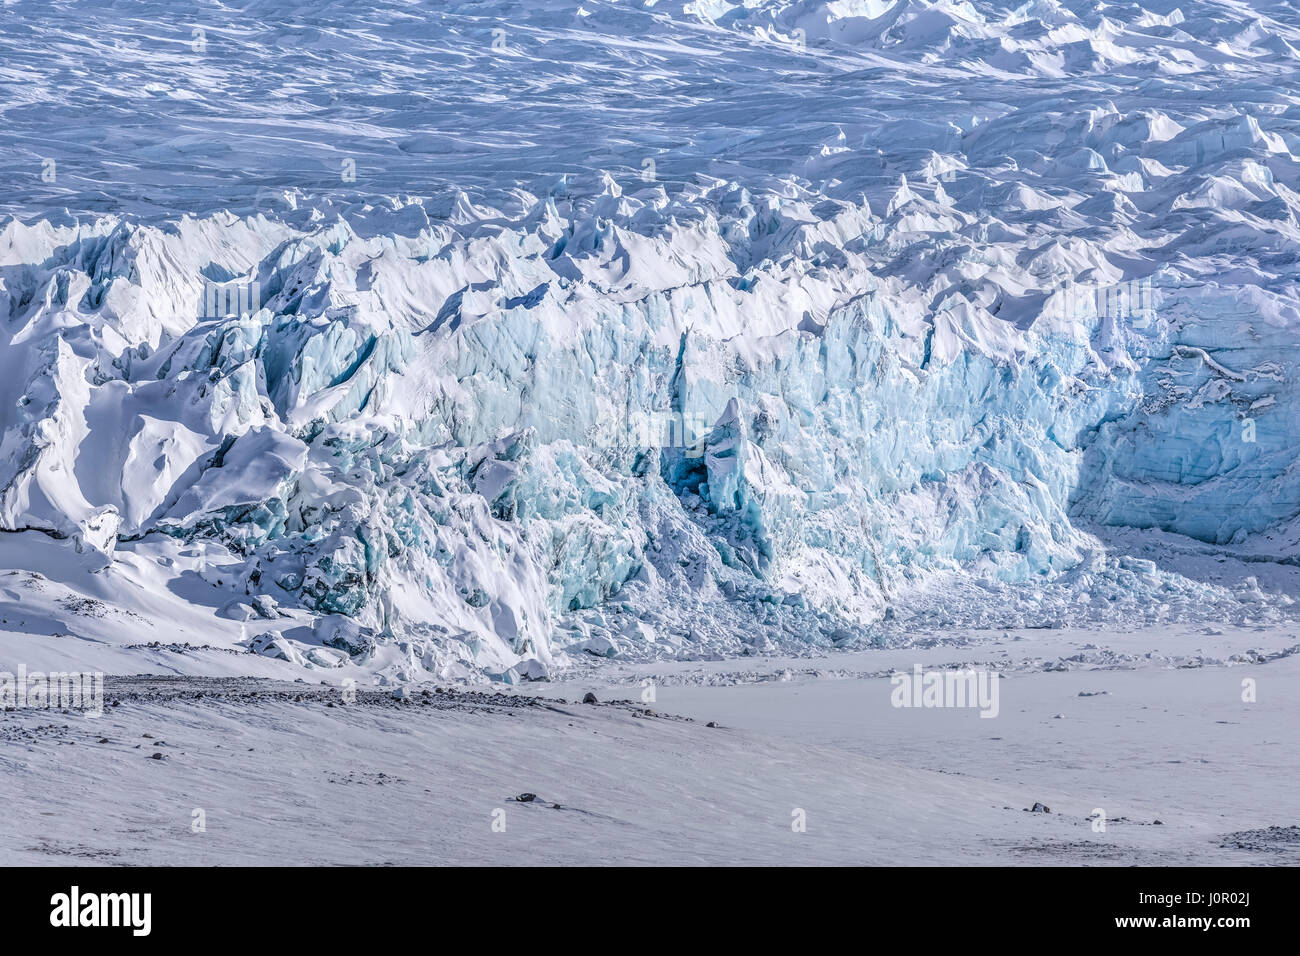 Ice Cap, point 660, Kangerlussuaq, Cercle Arctique, Groenland, de l'Europe Photo Stock